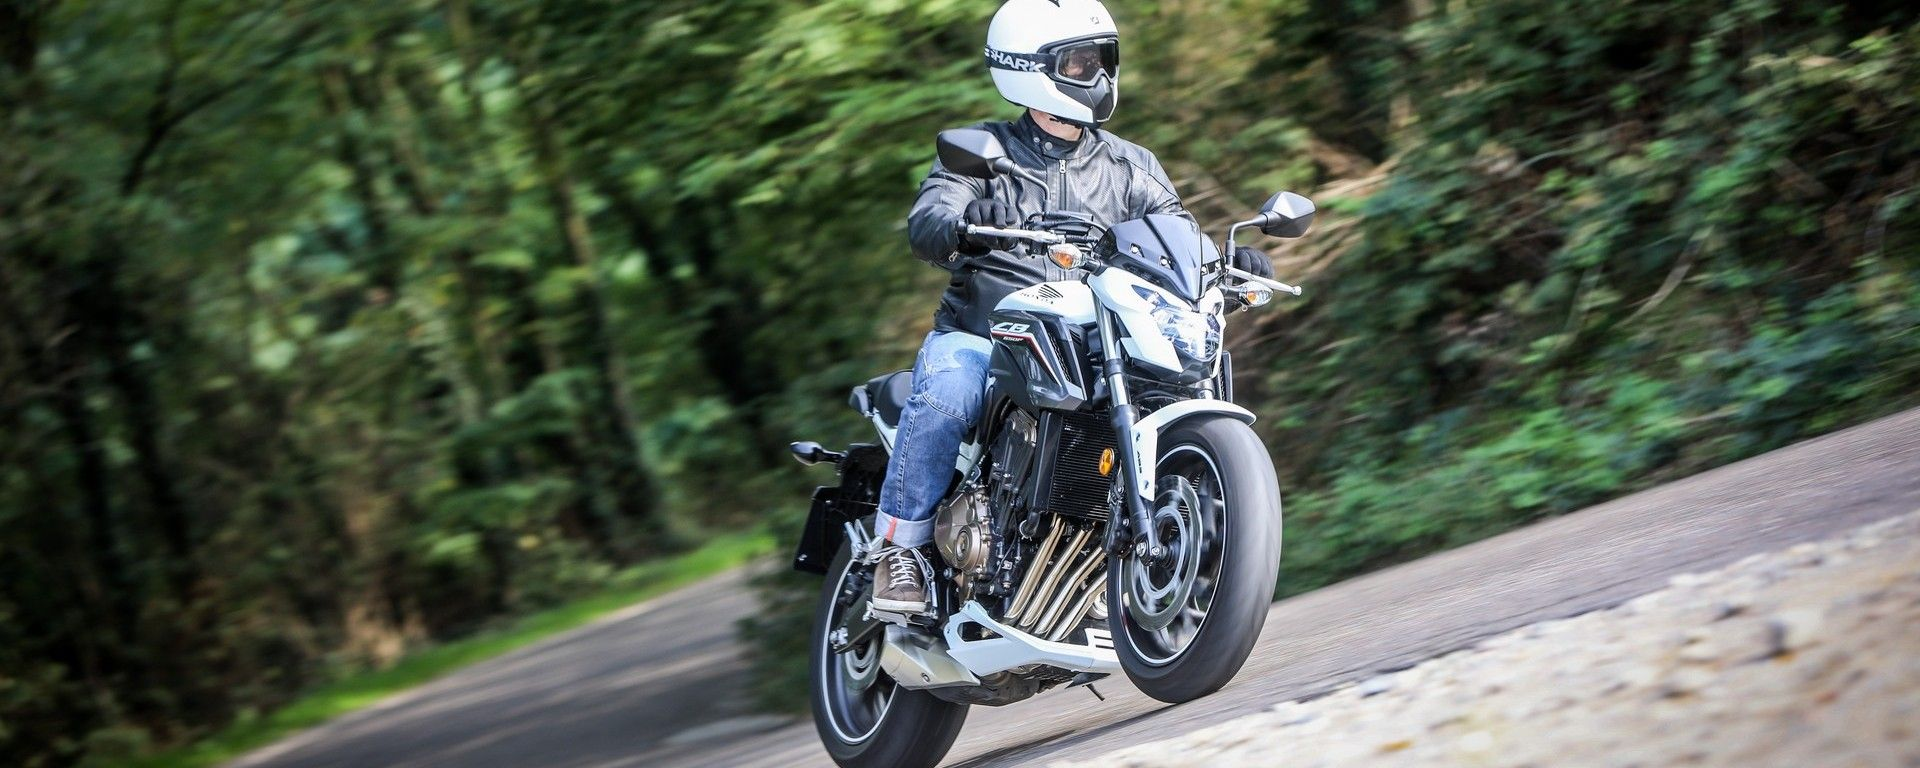 Honda CB650F: nel misto